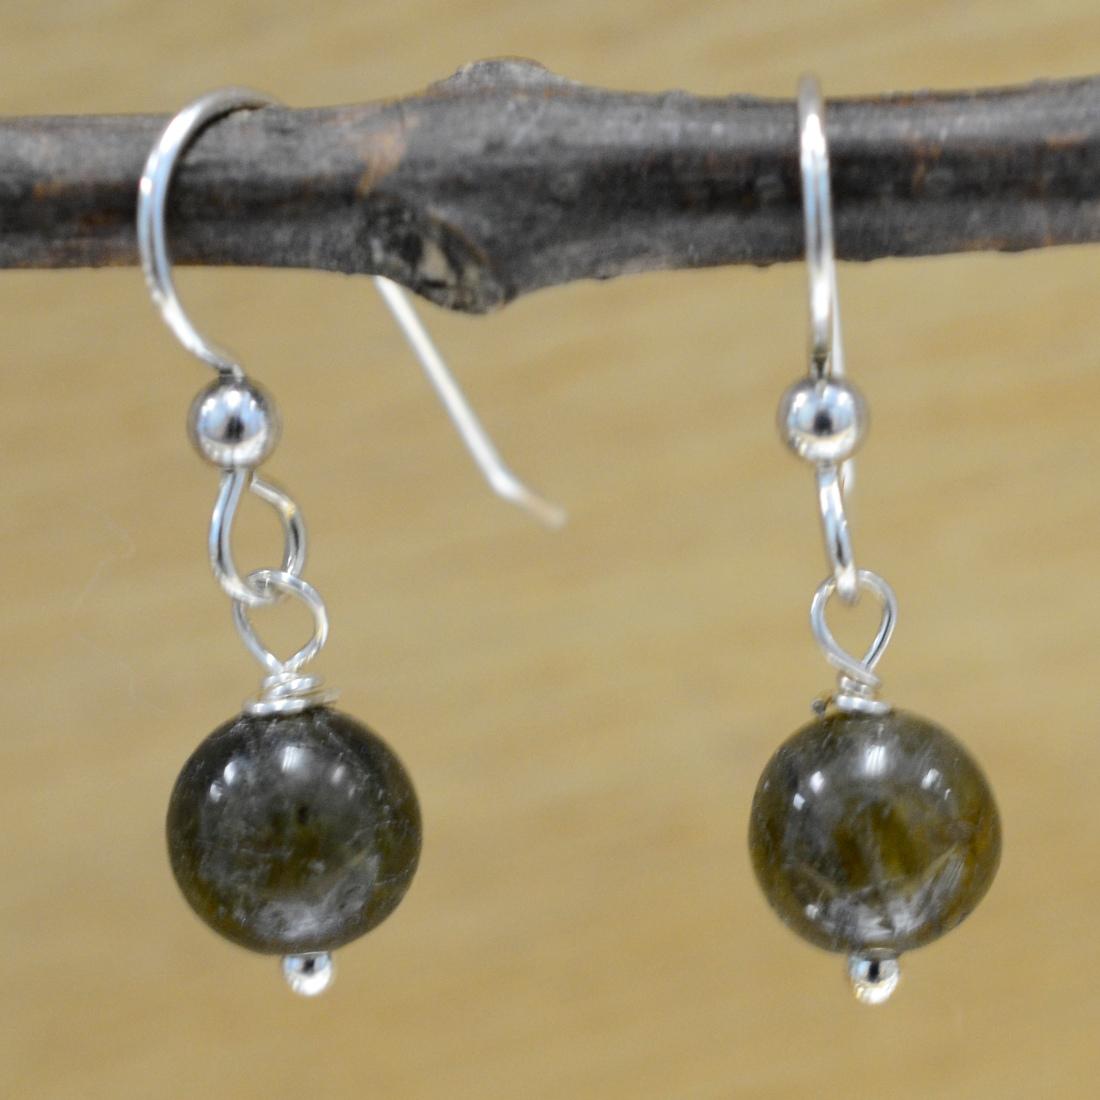 handmade labradorite and sterling silver earrings